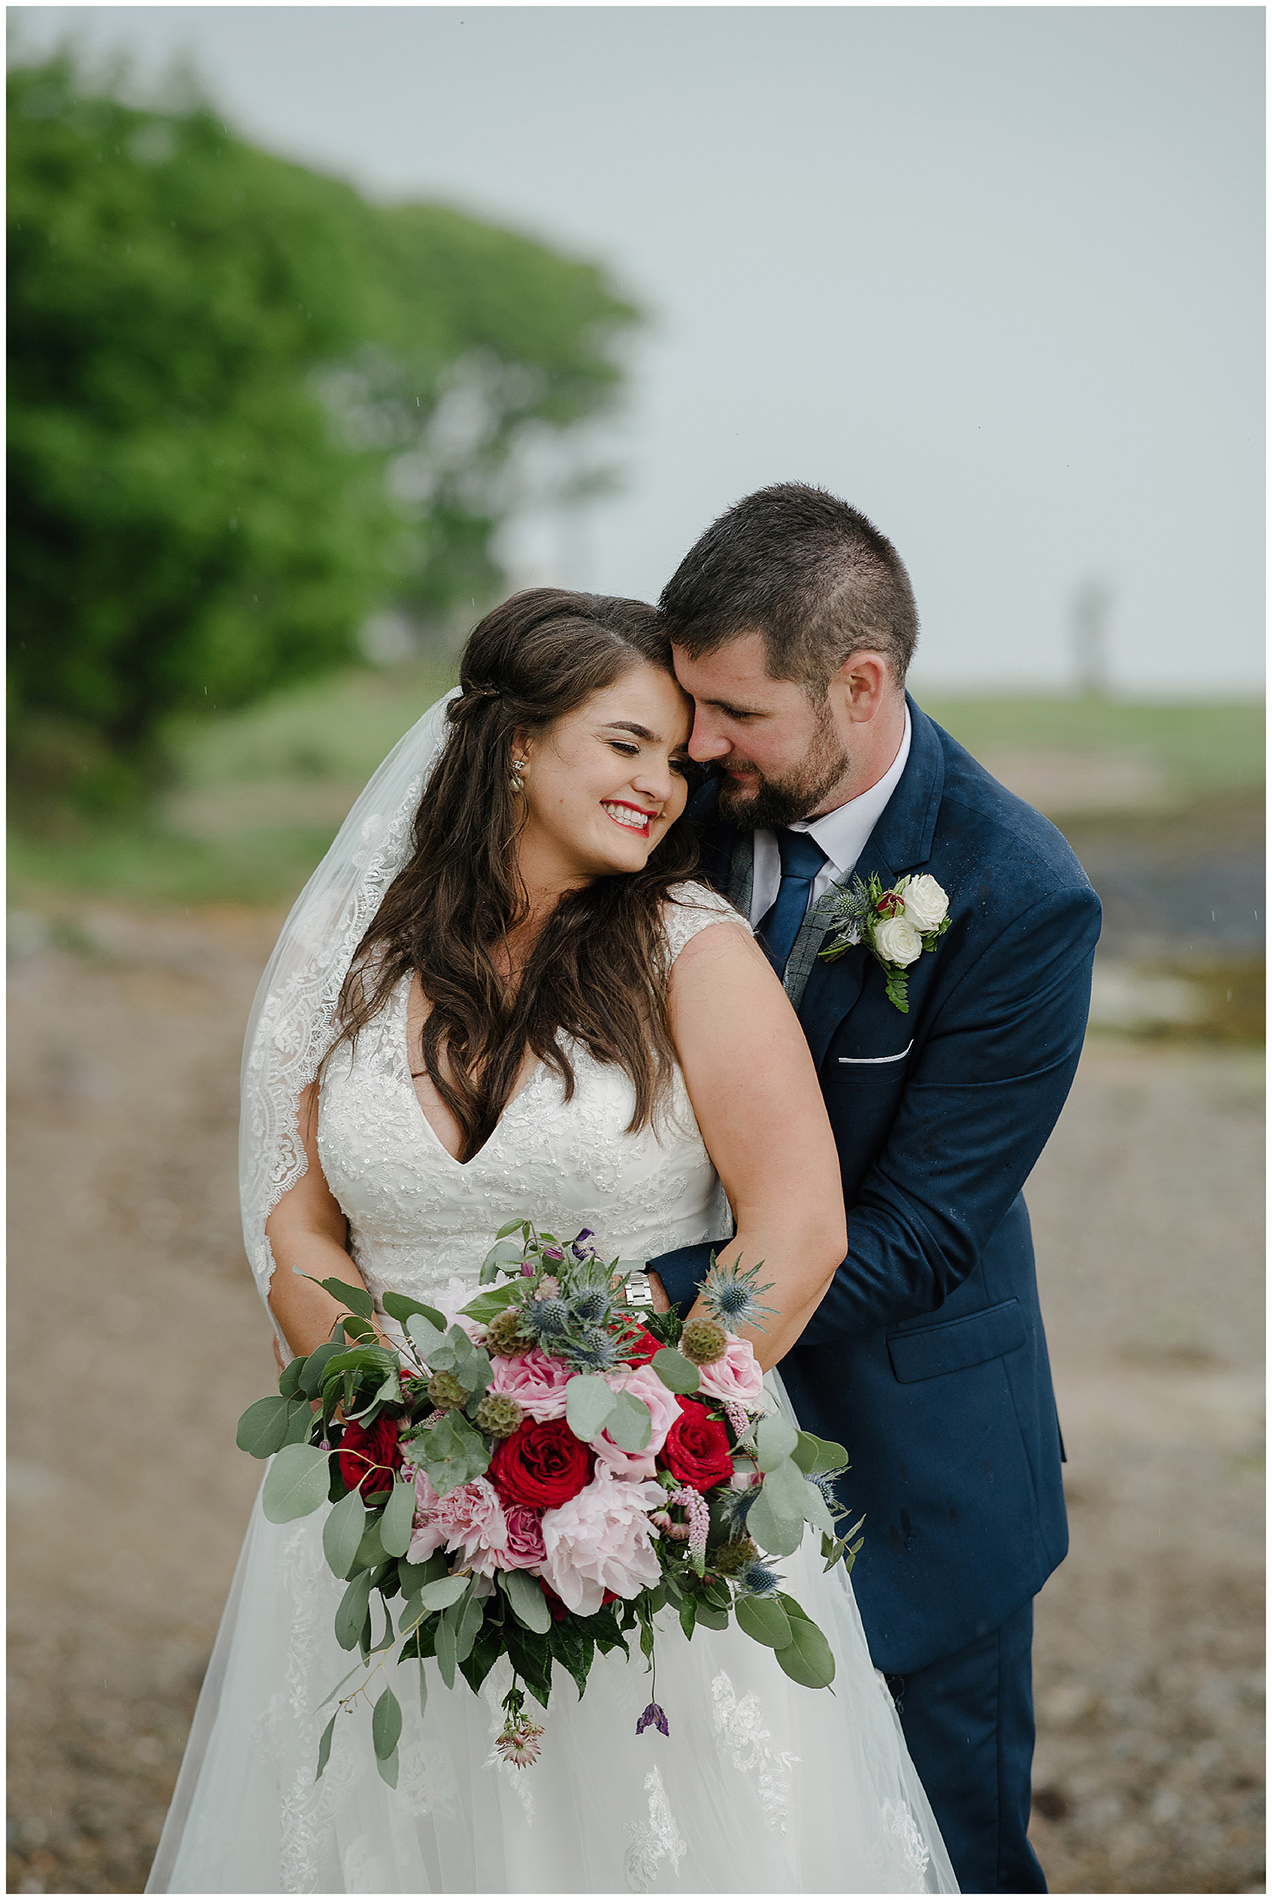 redcastle-hotel-wedding-karen-brian-jude-browne-photography-099.jpg